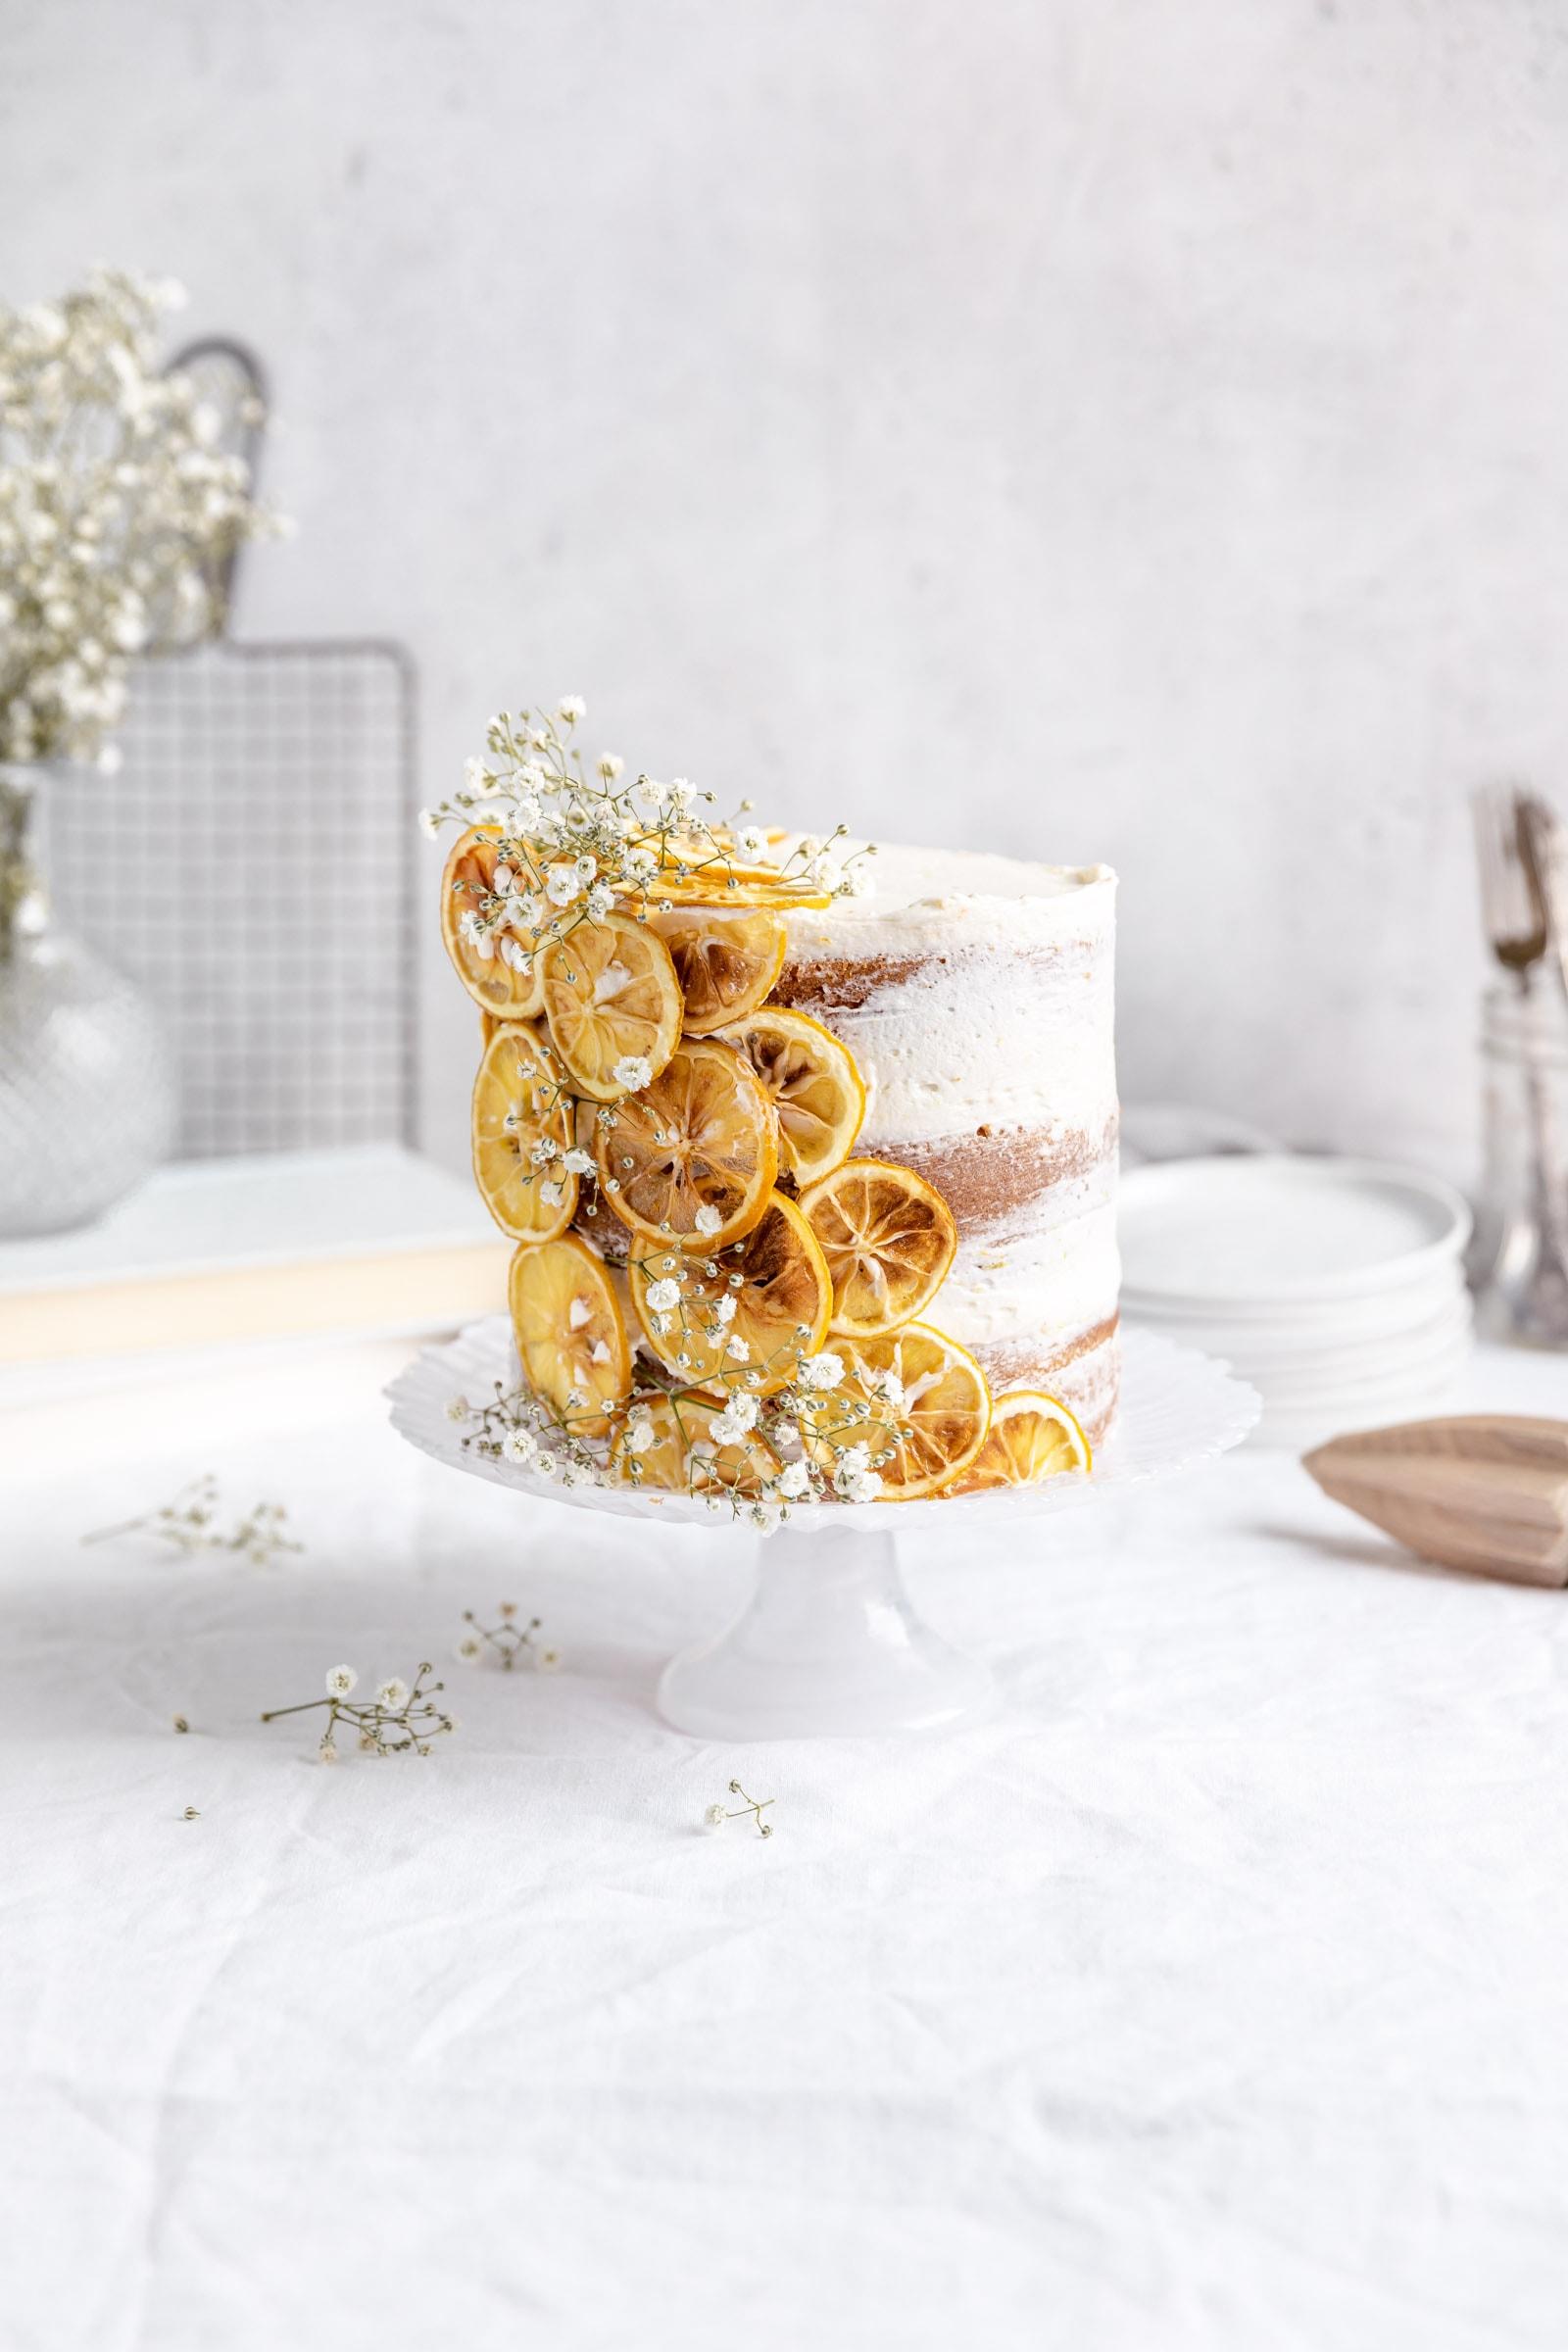 lemon cake with dried lemons